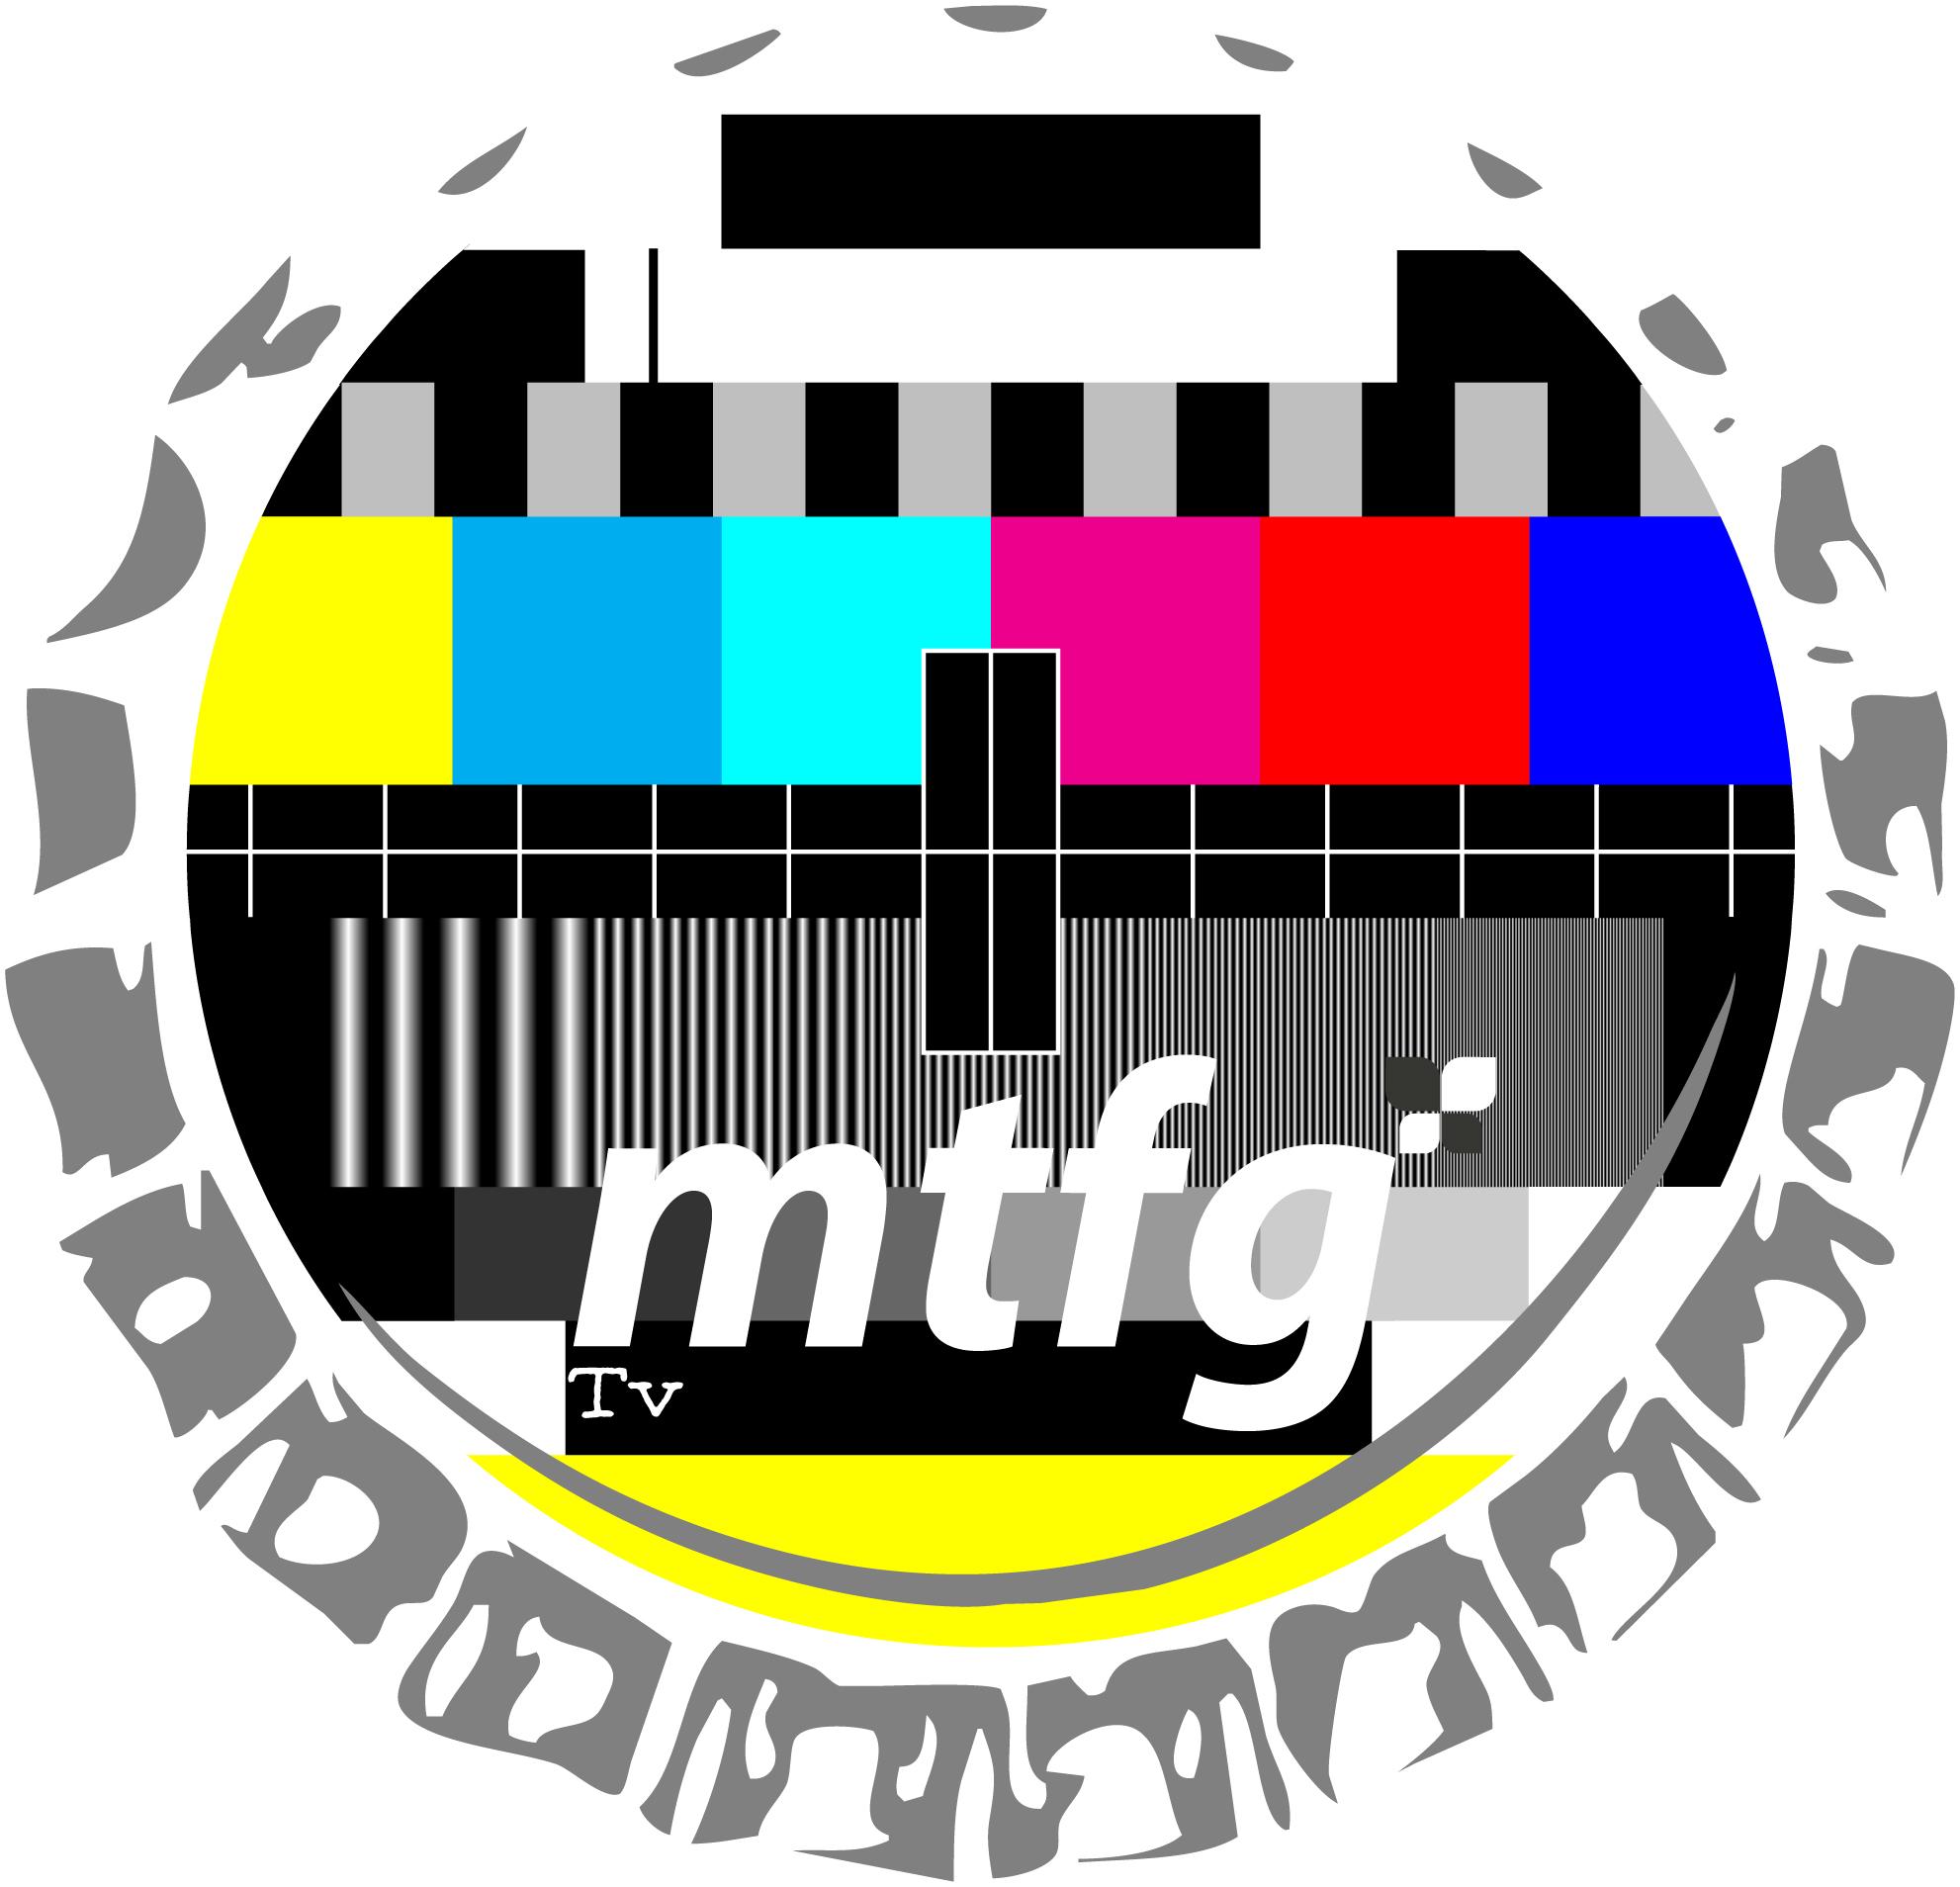 MTFG TV